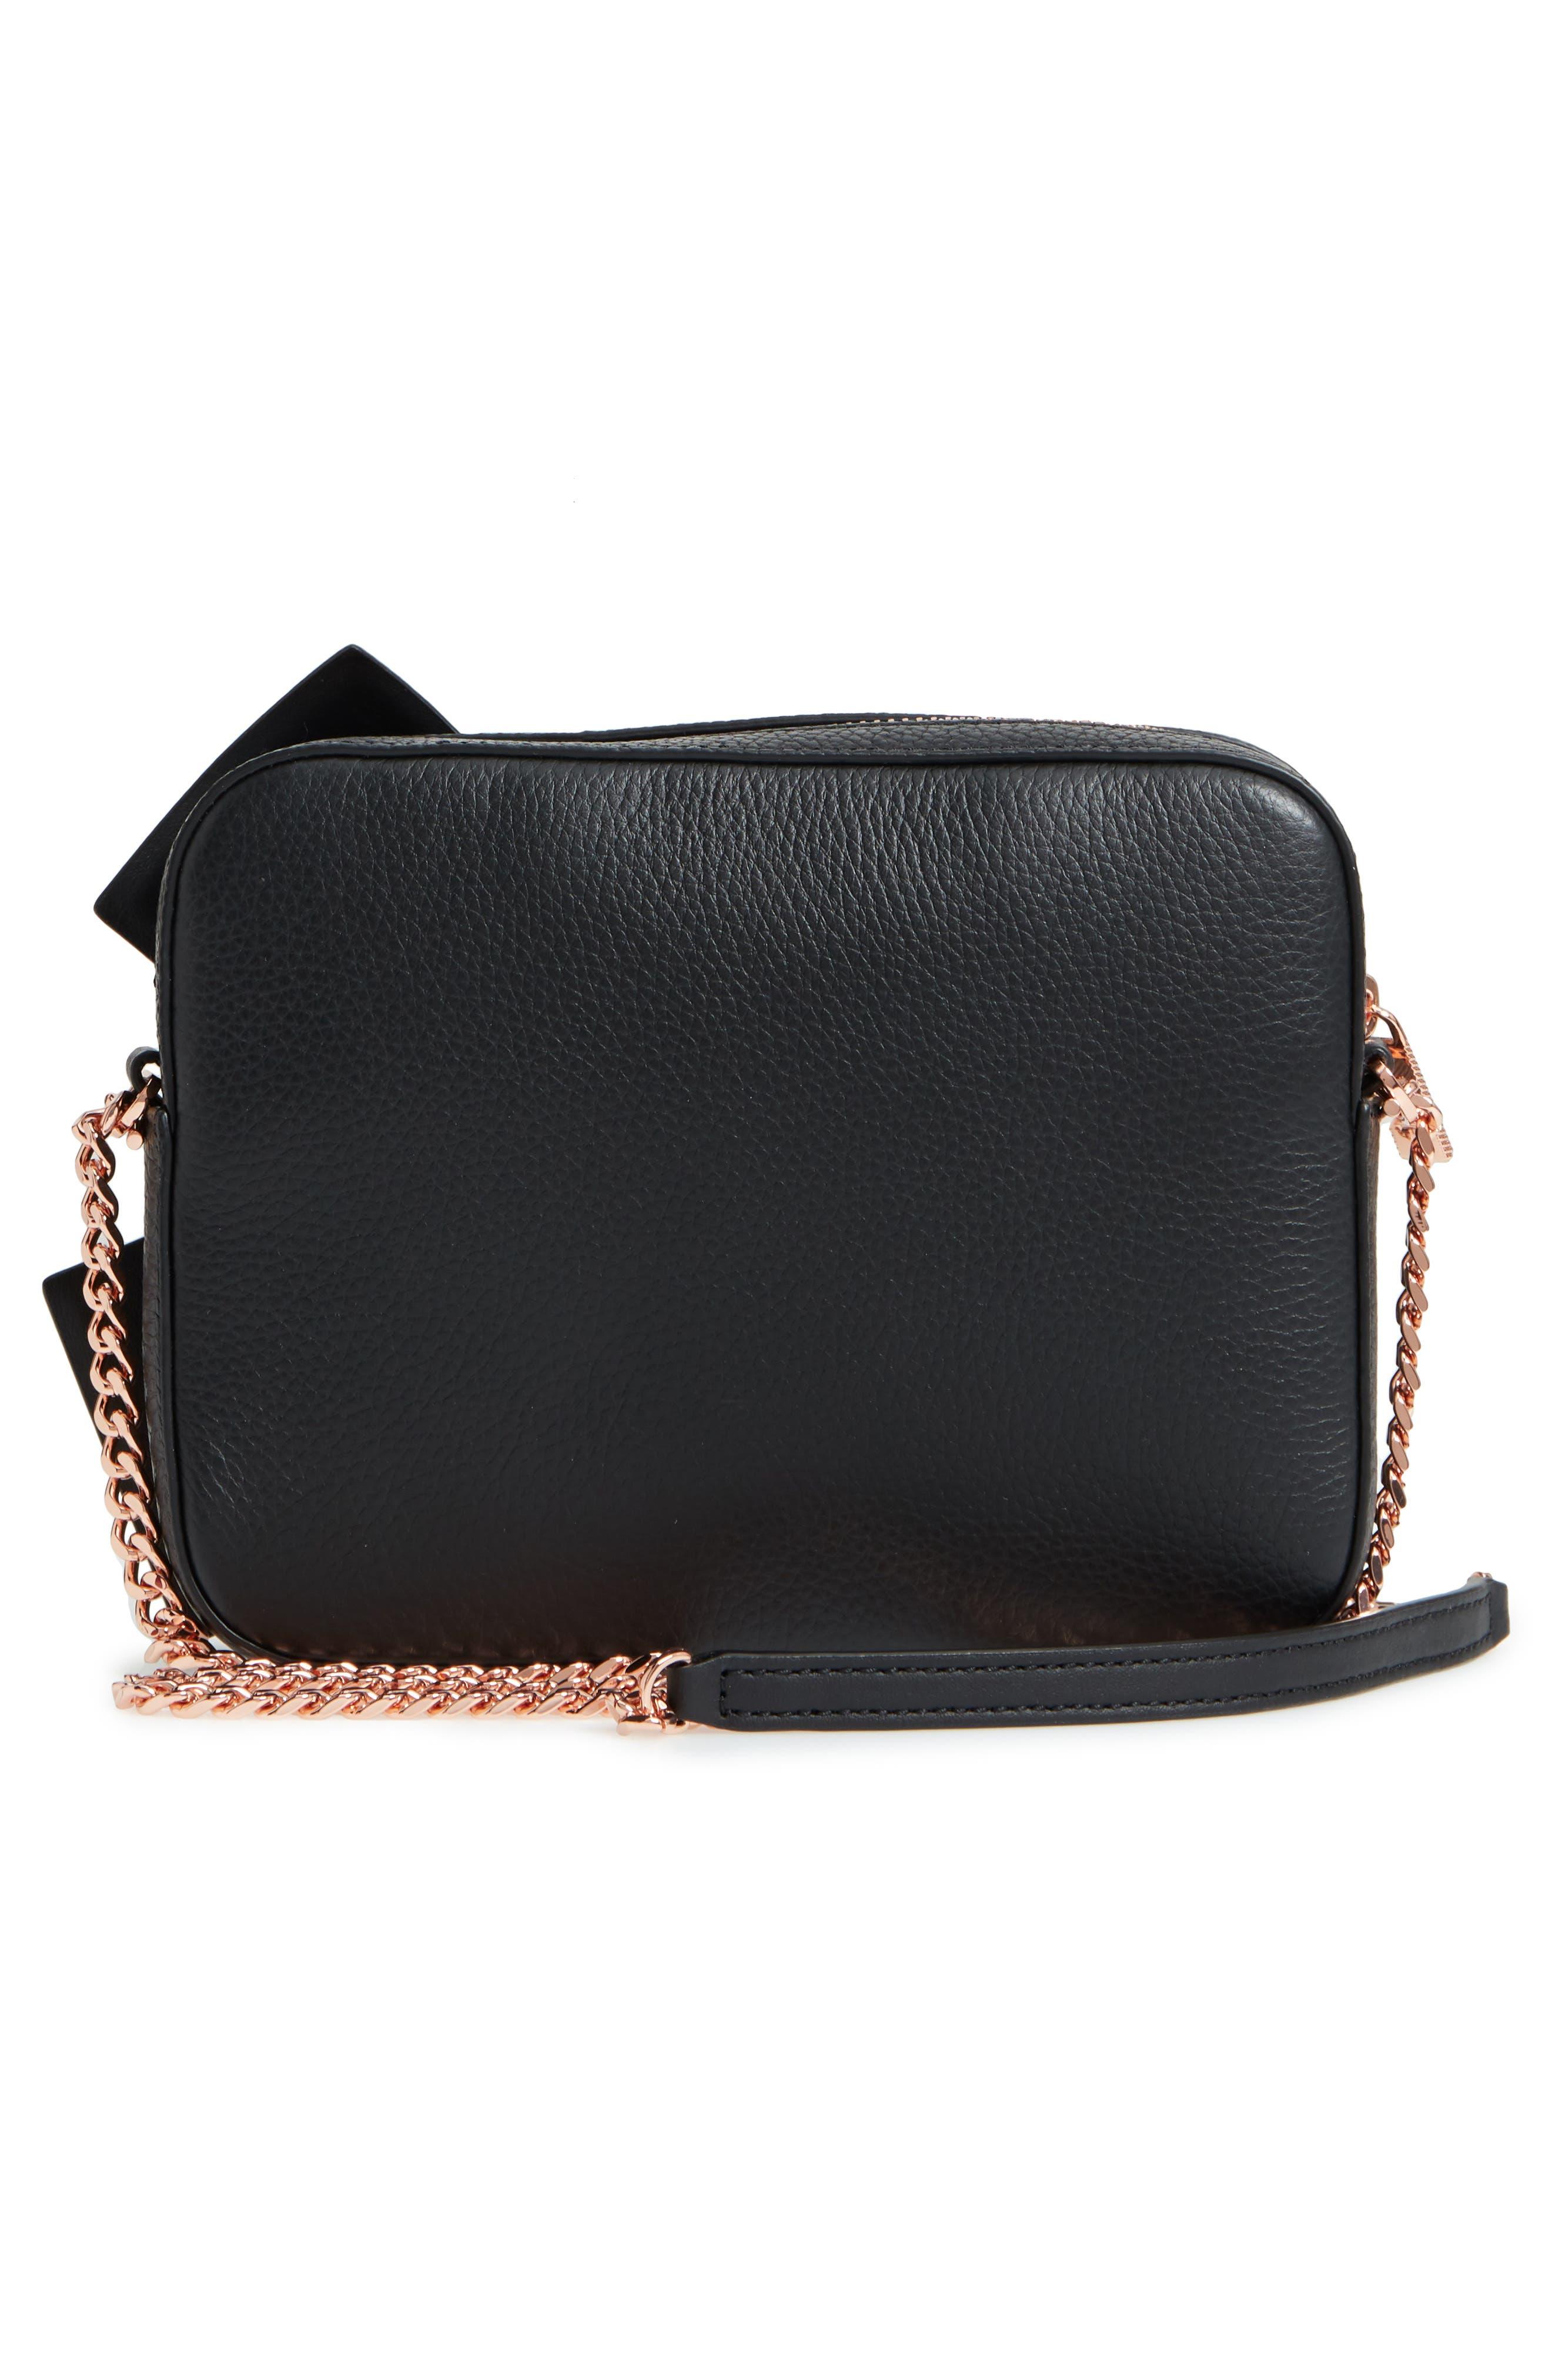 Giant Knot Leather Camera Bag,                             Alternate thumbnail 3, color,                             BLACK